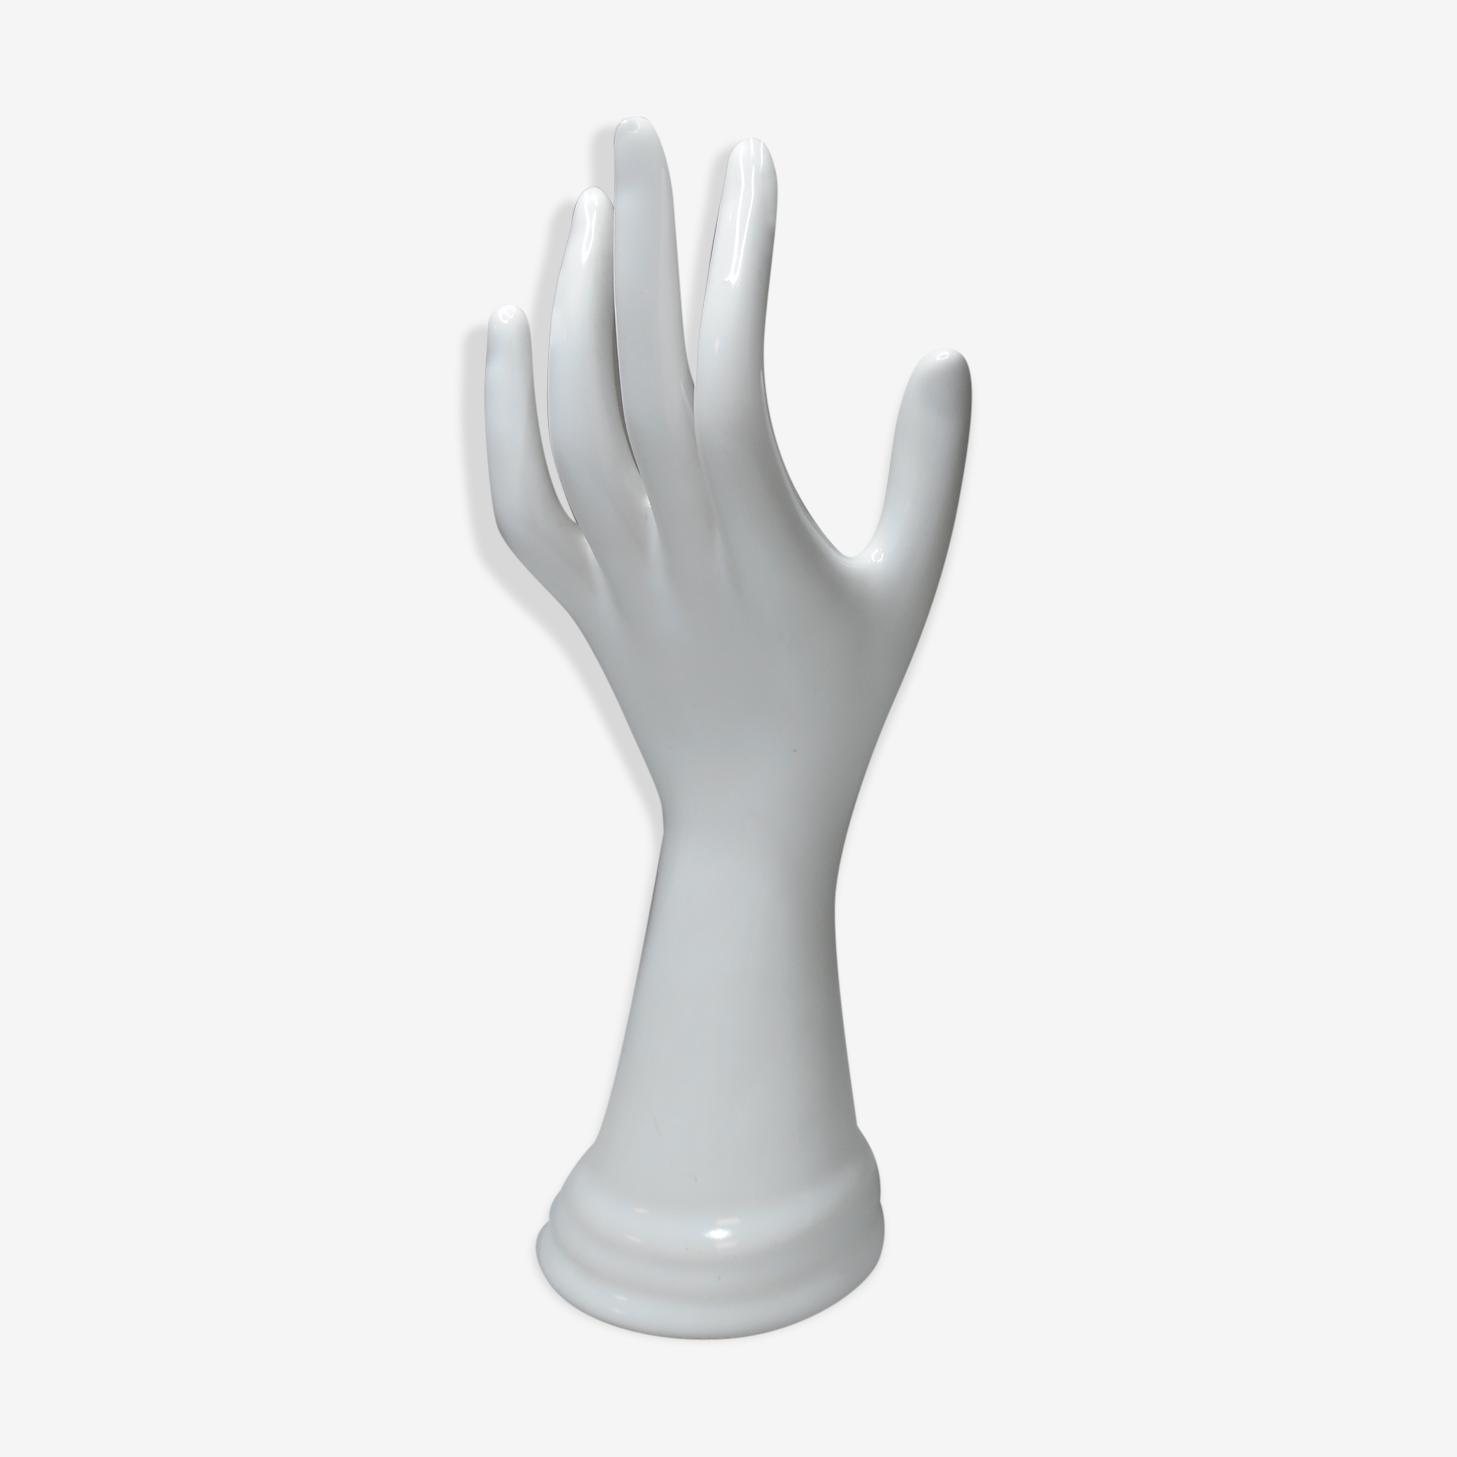 Main enfant porcelaine blanche vintage